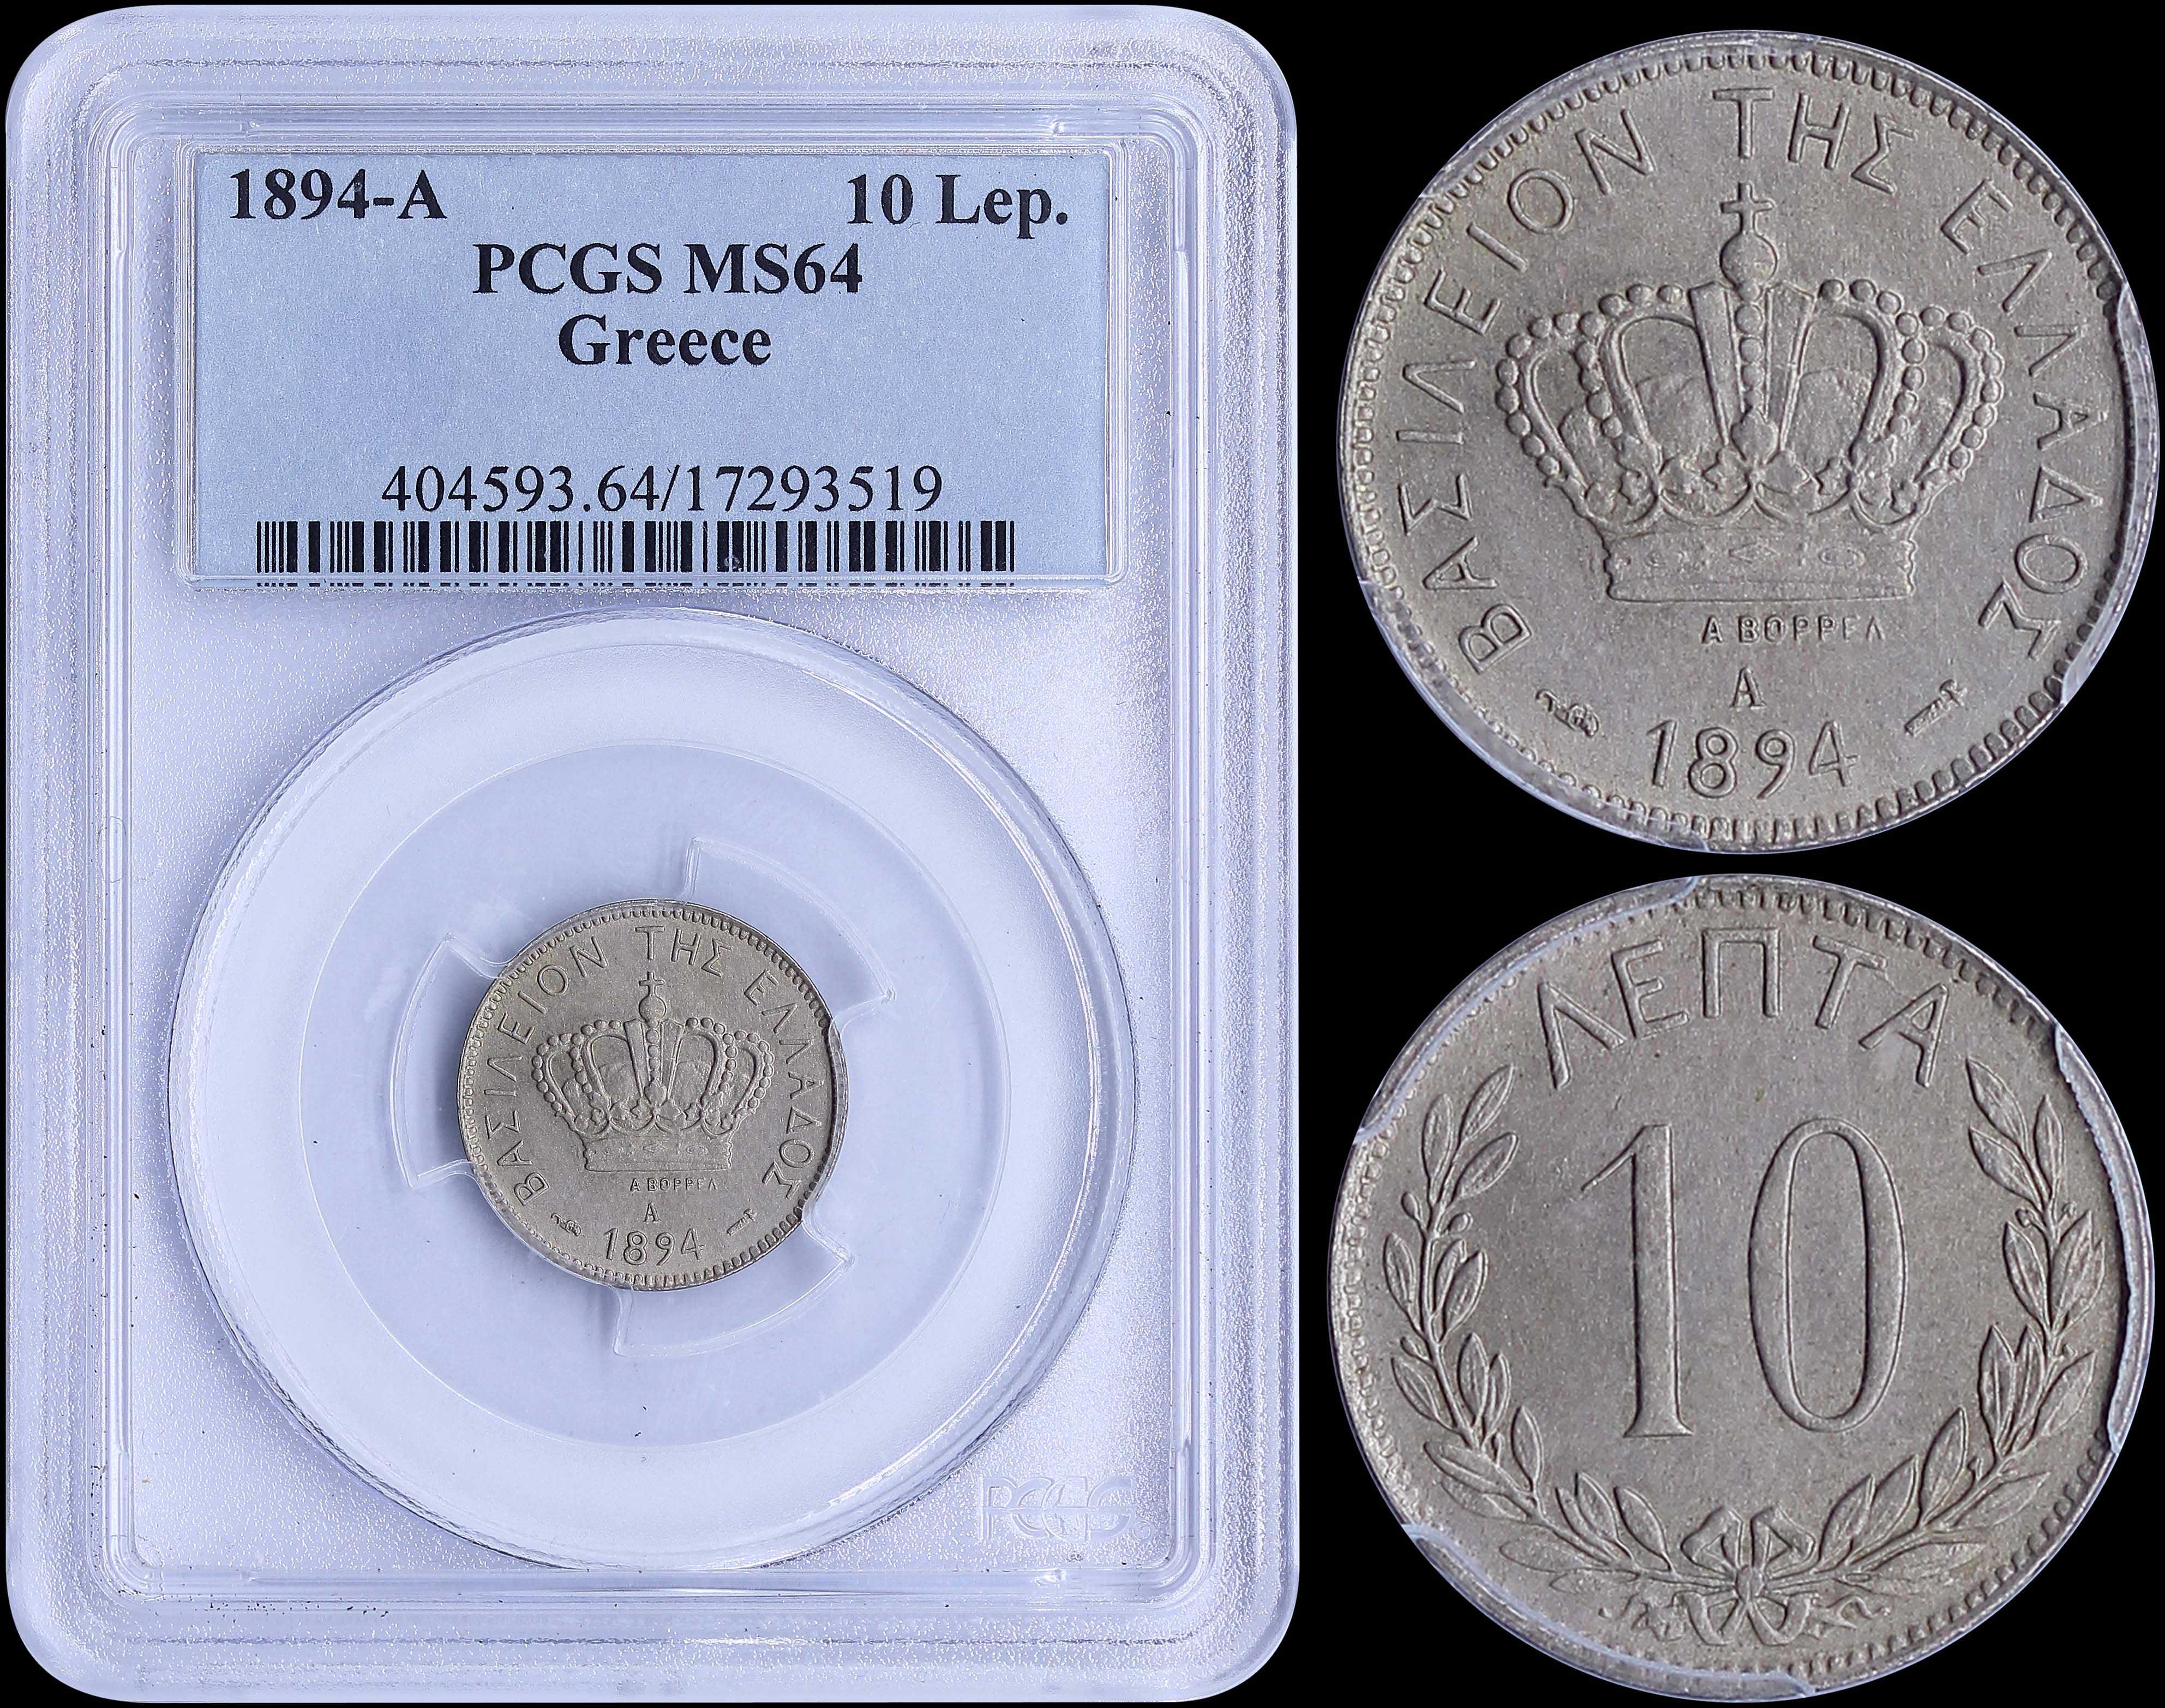 Lot 6106 - -  COINS & TOKENS king george i -  A. Karamitsos Public Auction 655